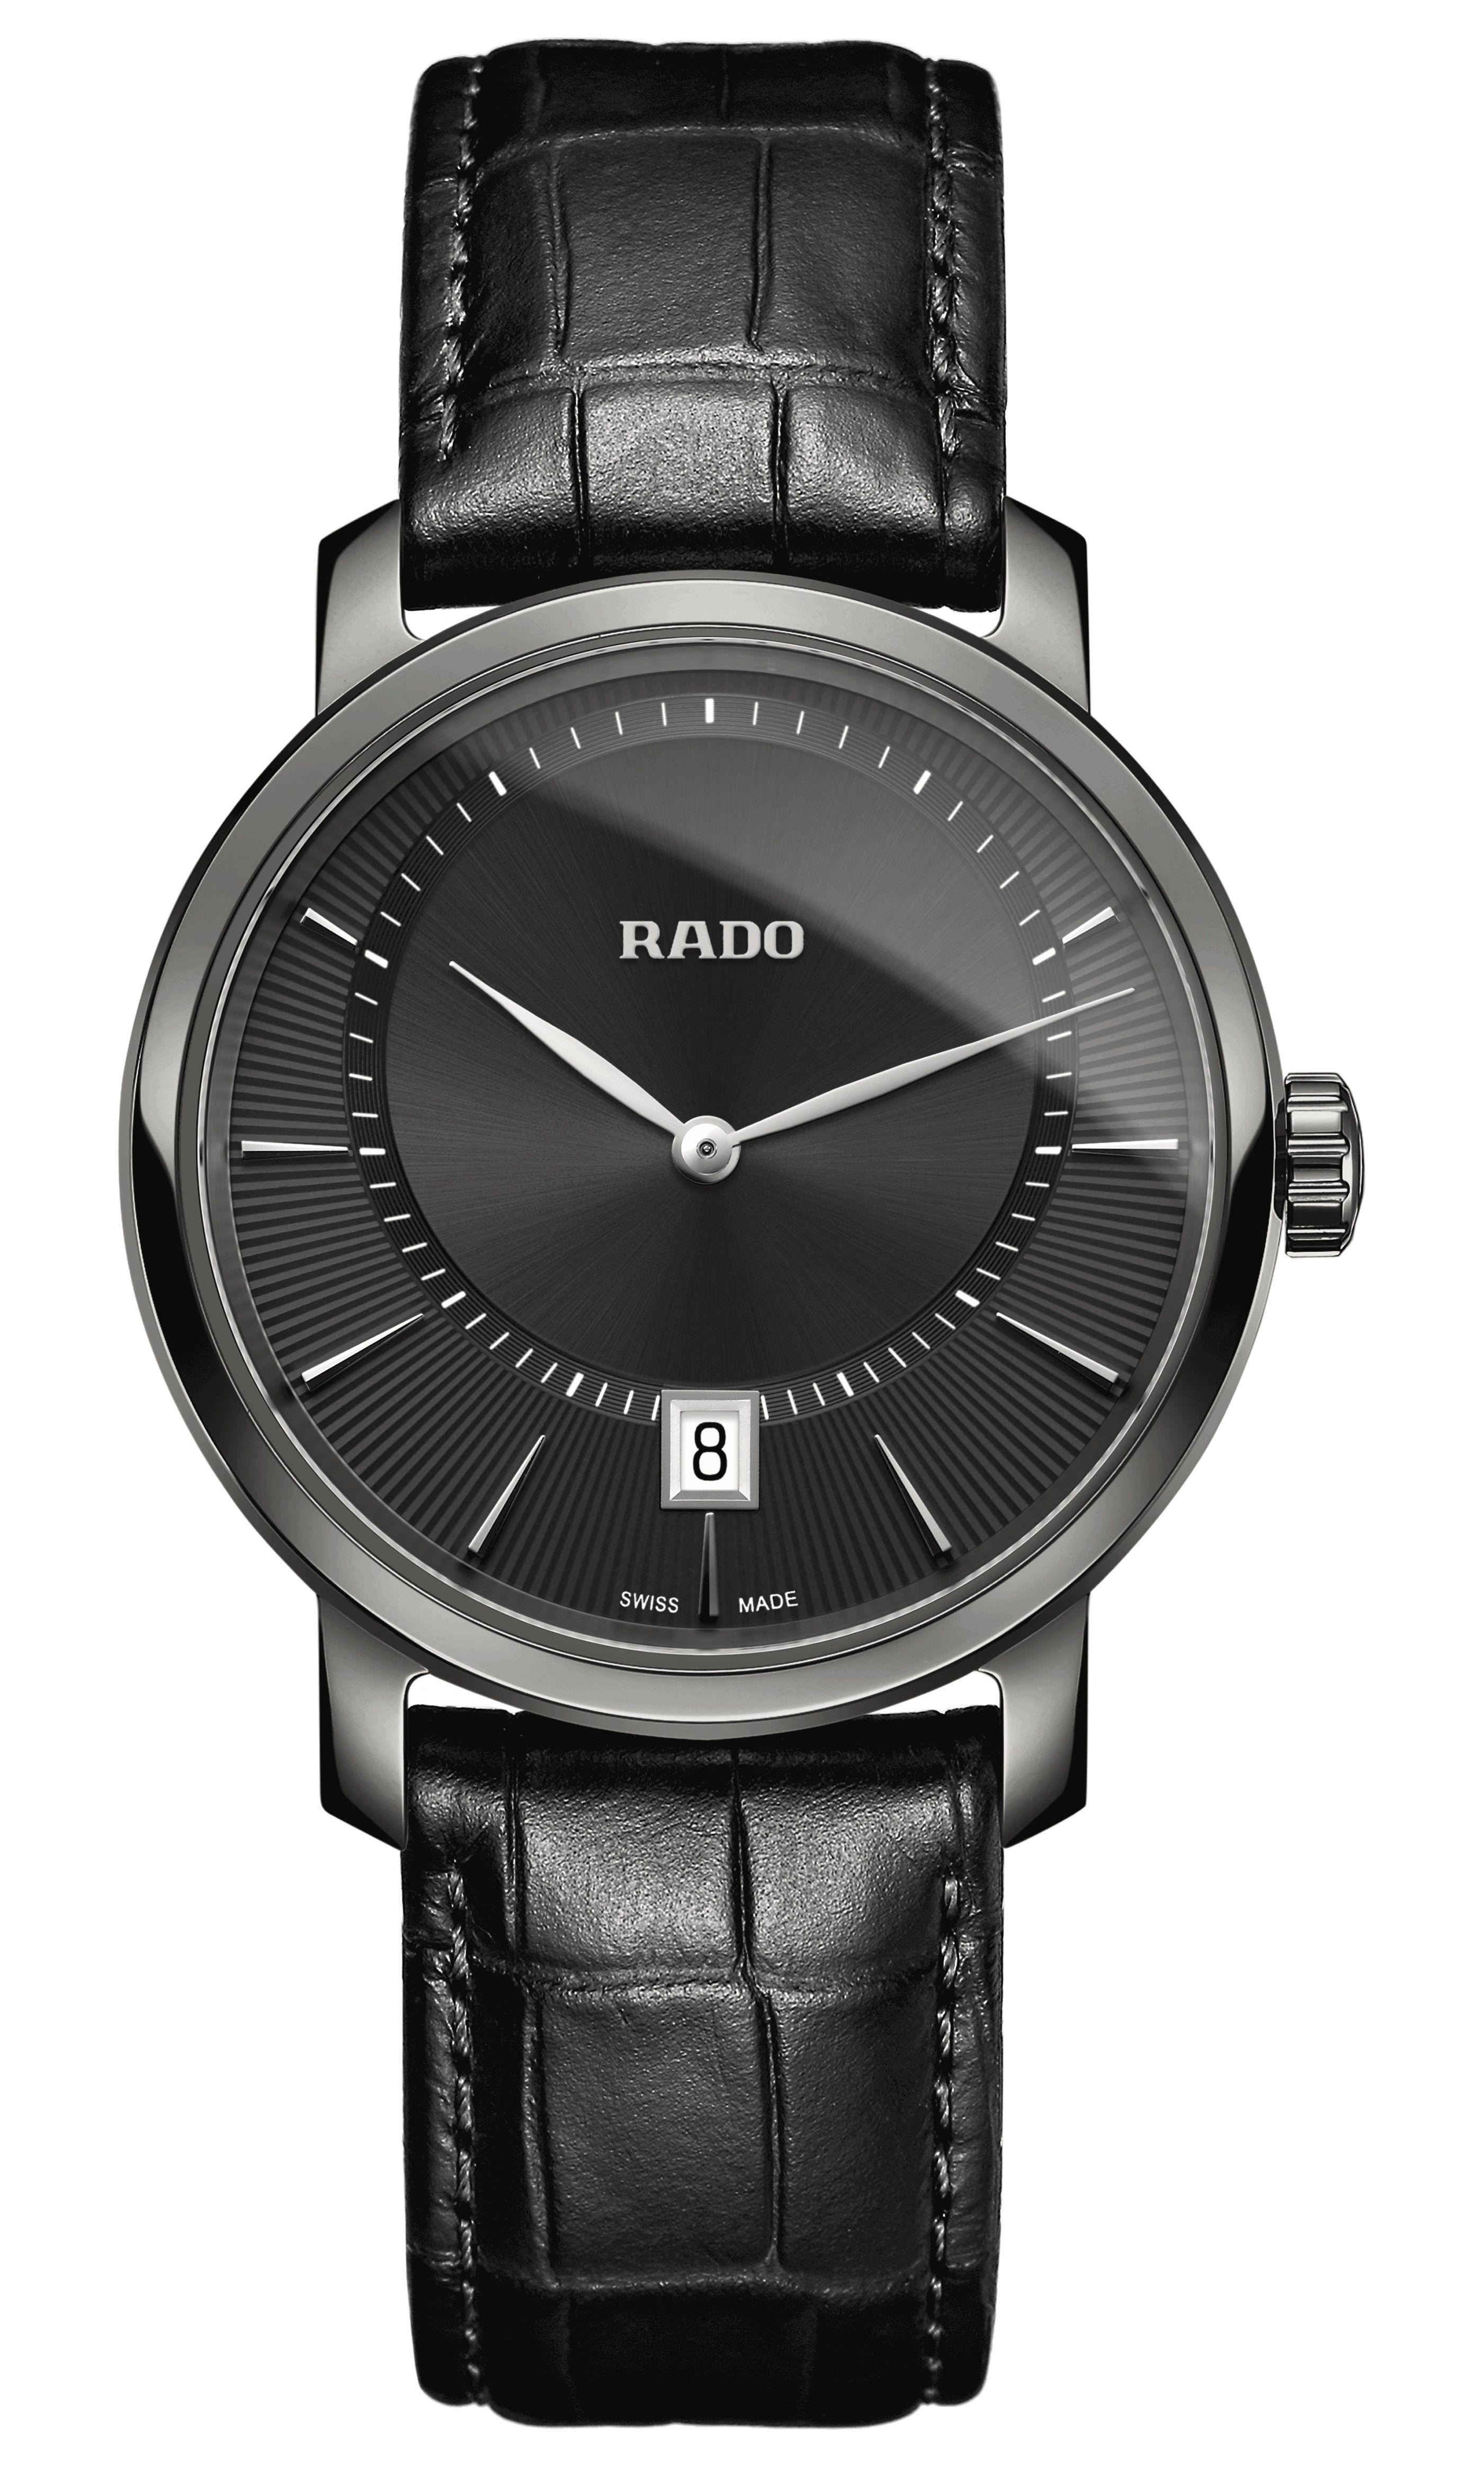 Rado Xl Diamaster Online Black Leather Strap Leather Straps Watches Unique